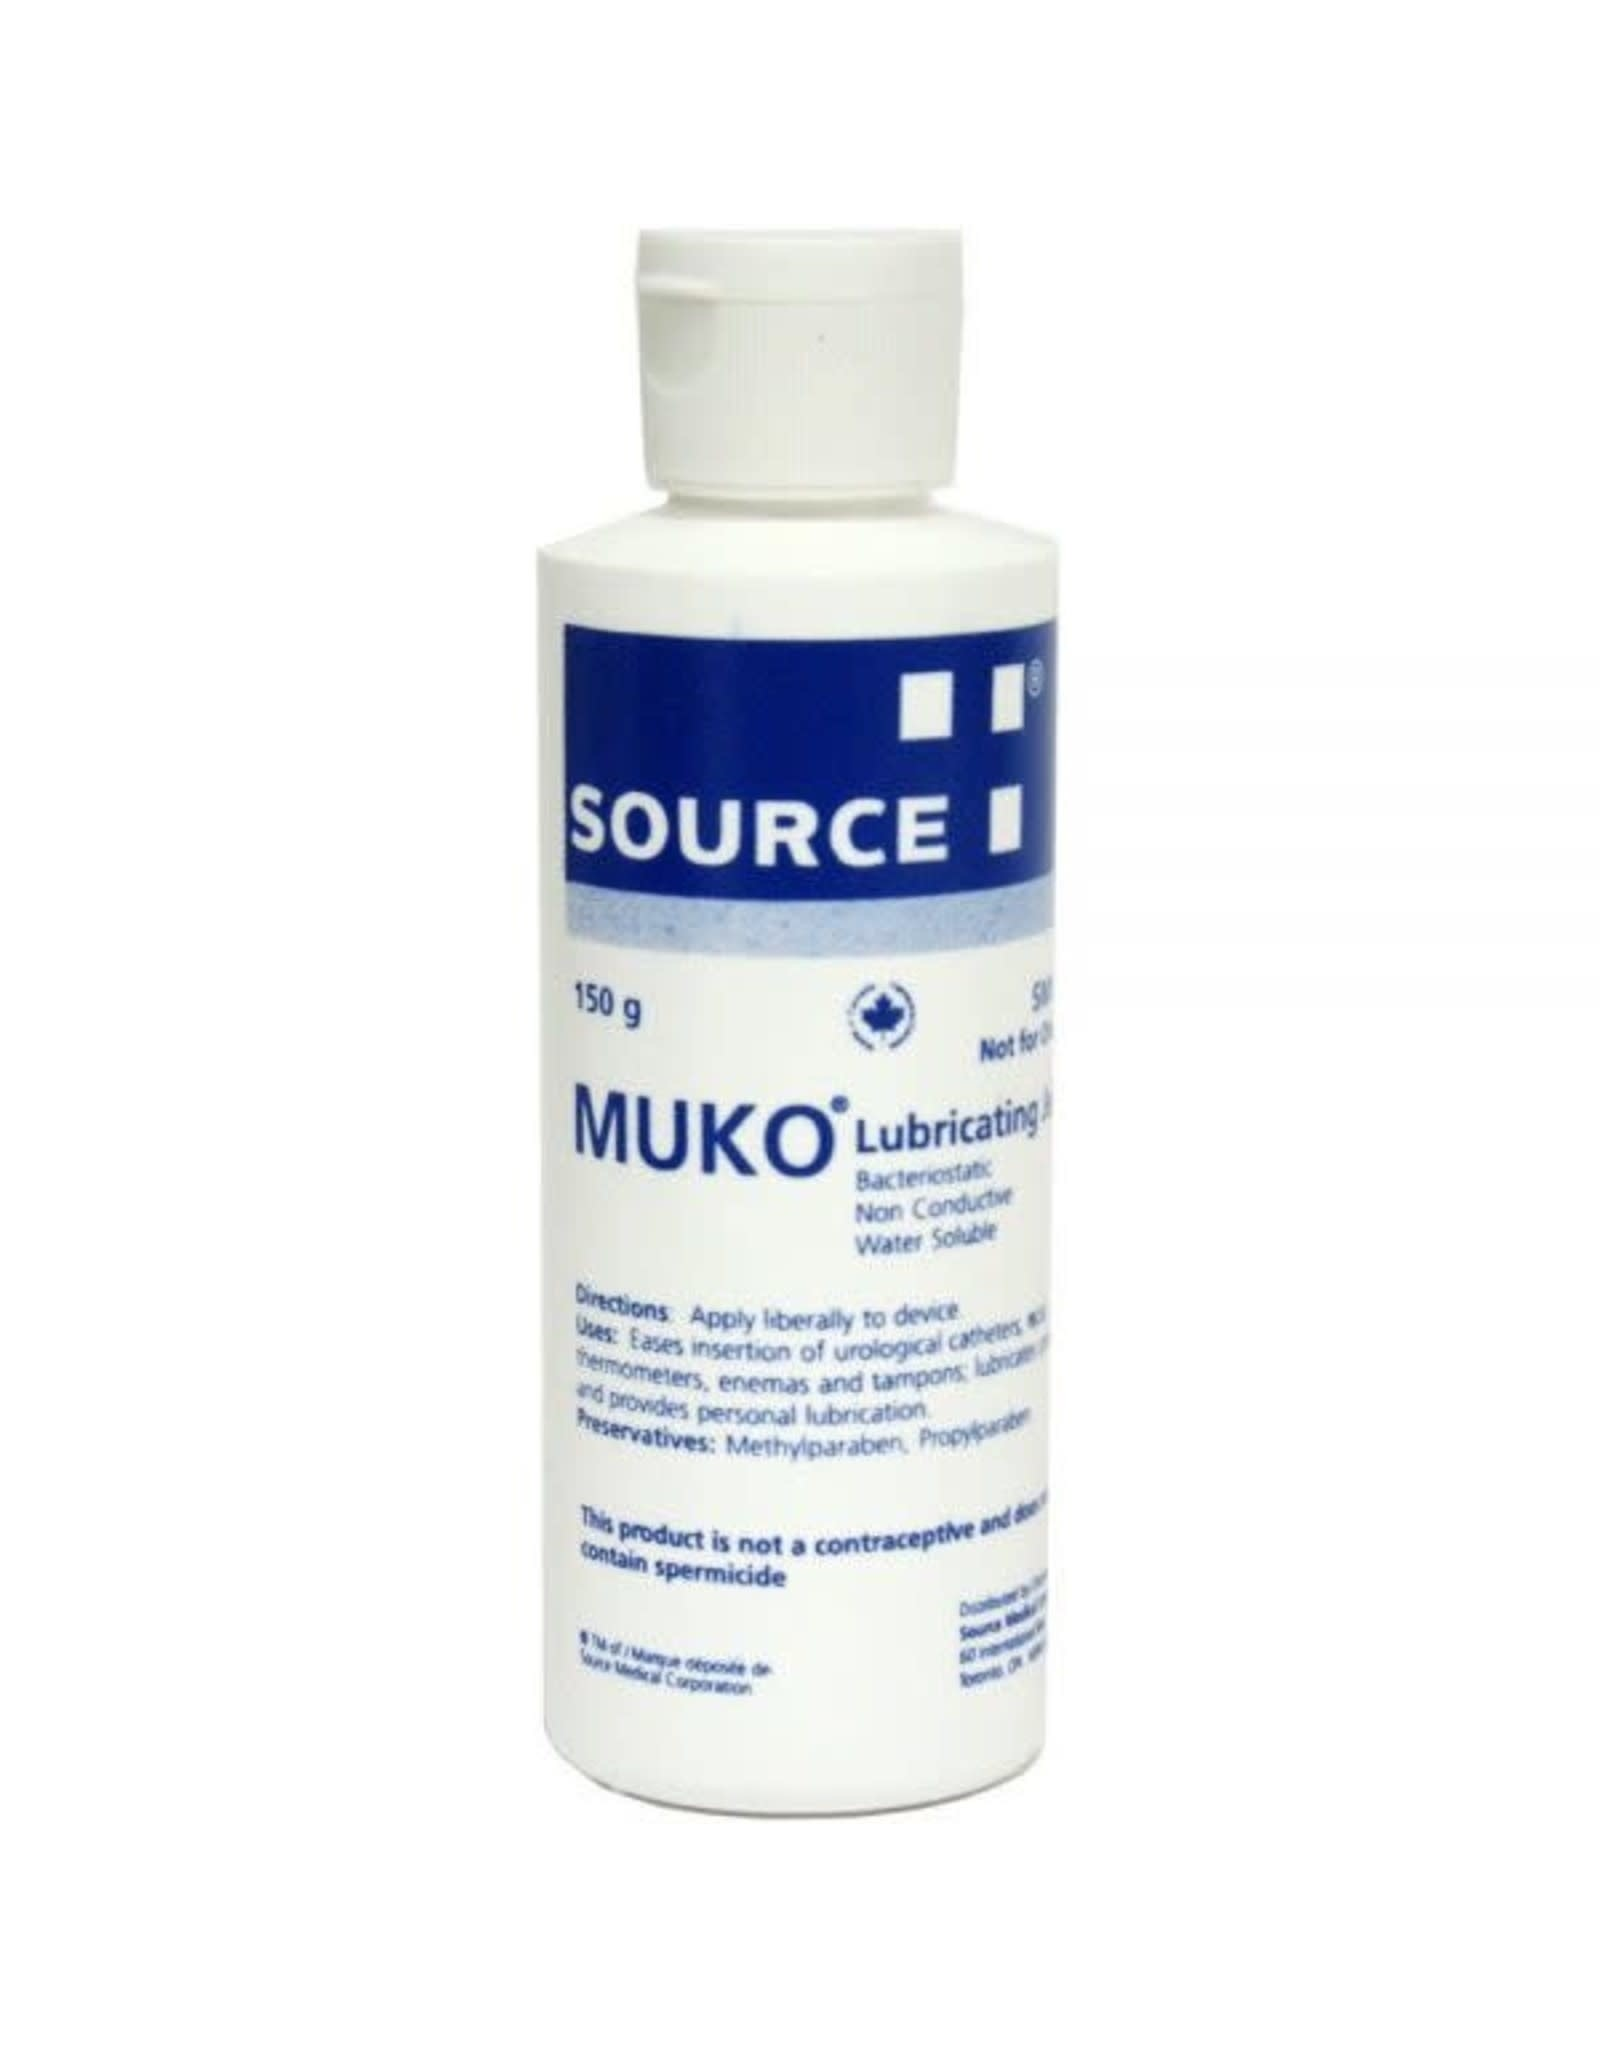 MUKO - LUBRICATING JELLY - 150G